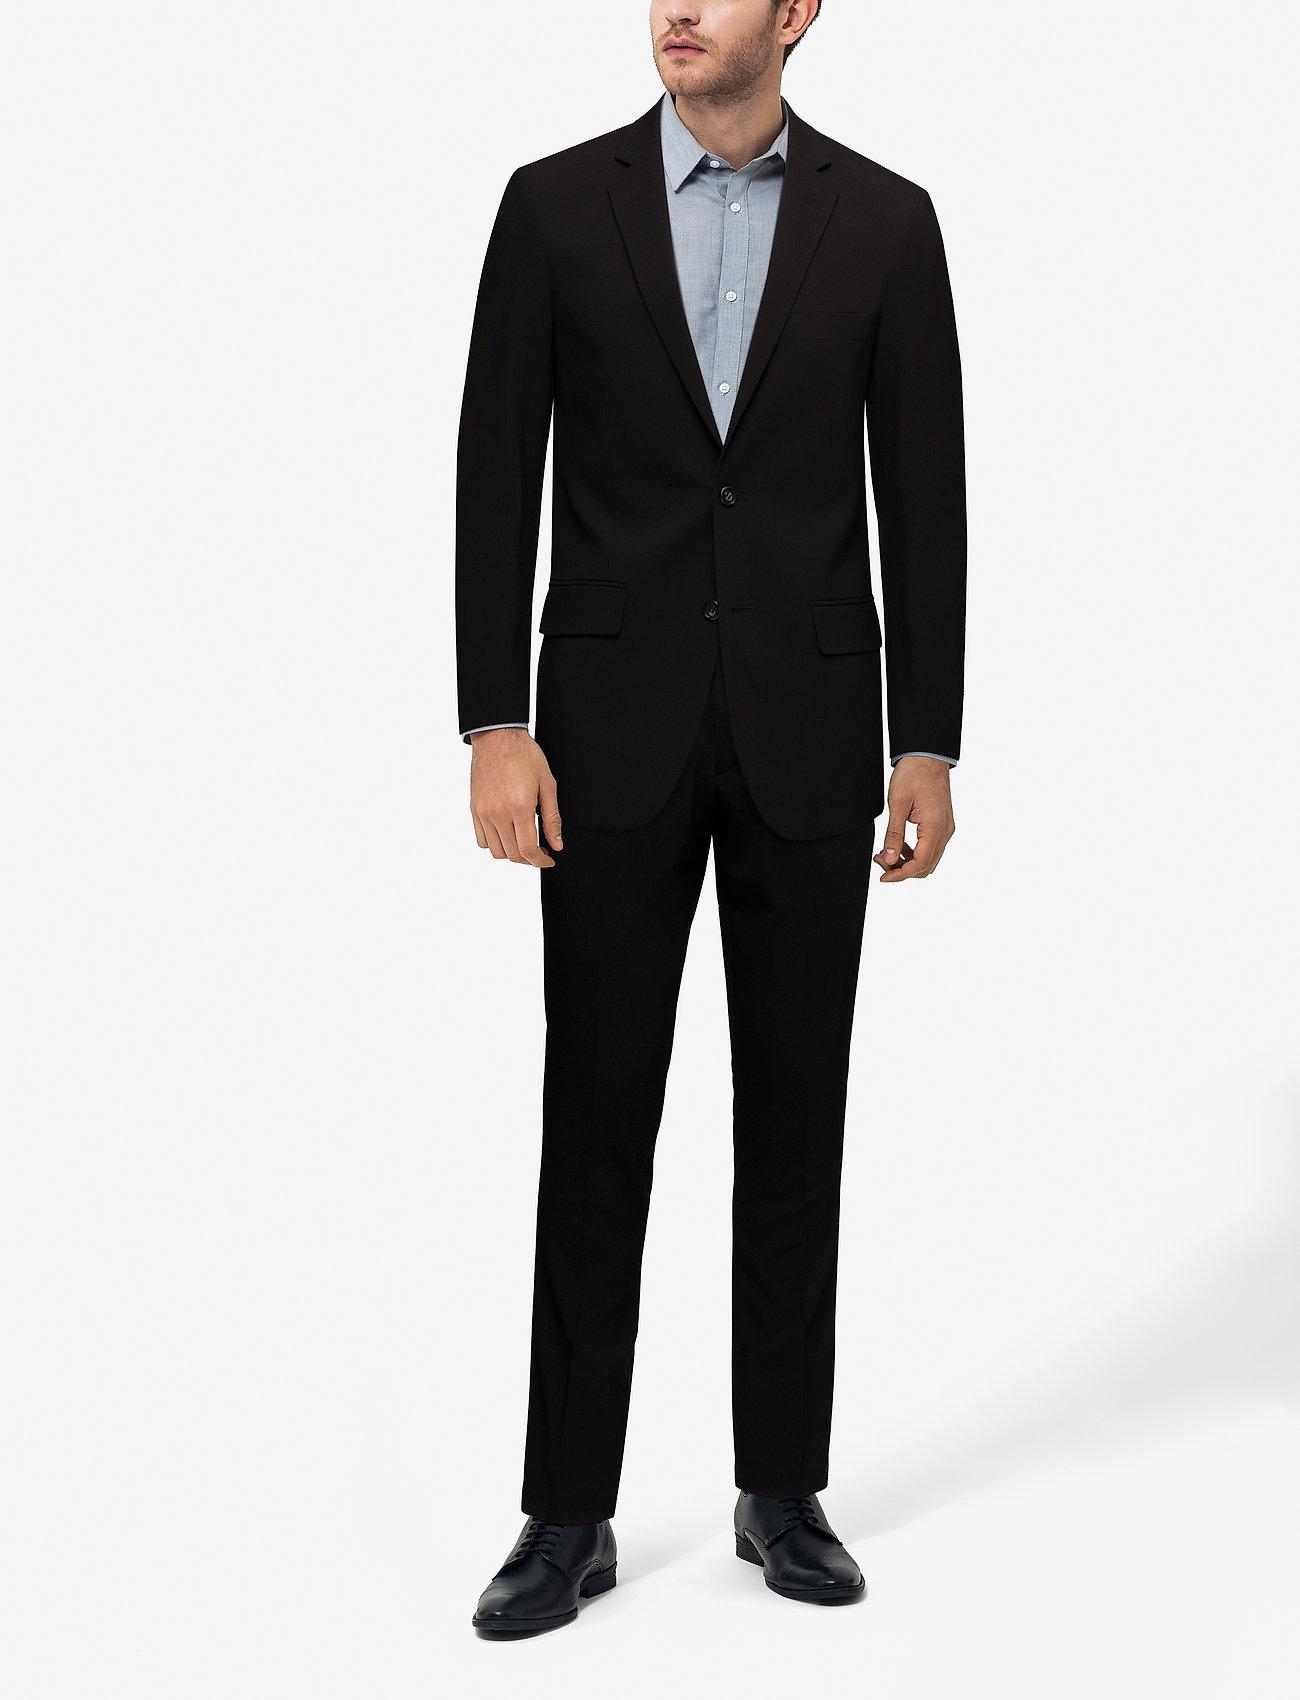 Lindbergh Mens suit